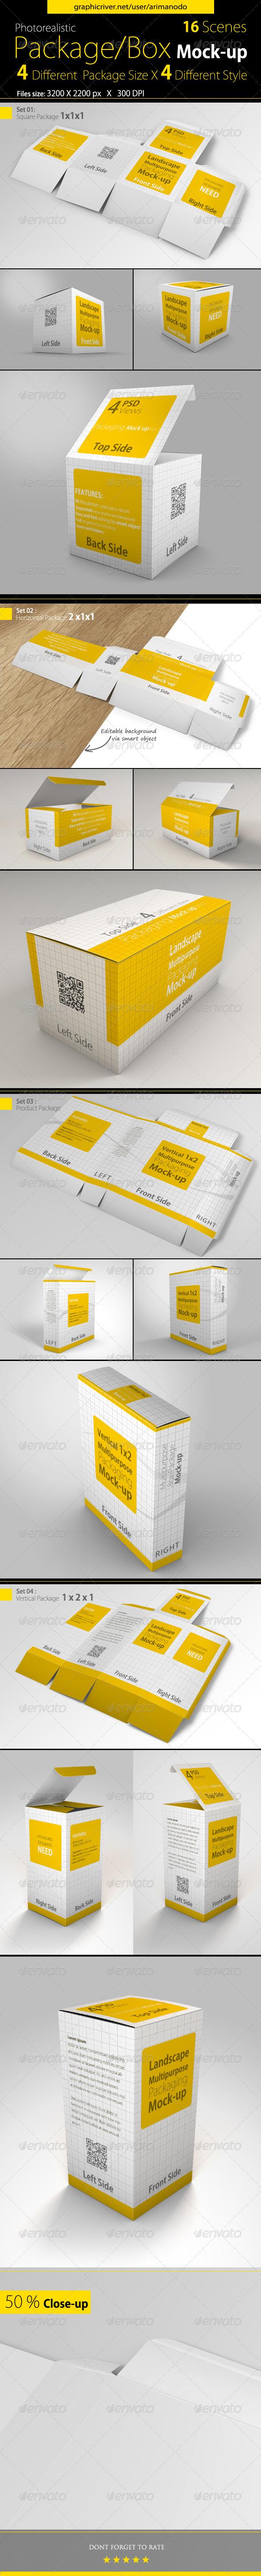 Download Multipurpose Package Box Mock Ups Graphic Design Mockup Box Mockup Packaging Mockup